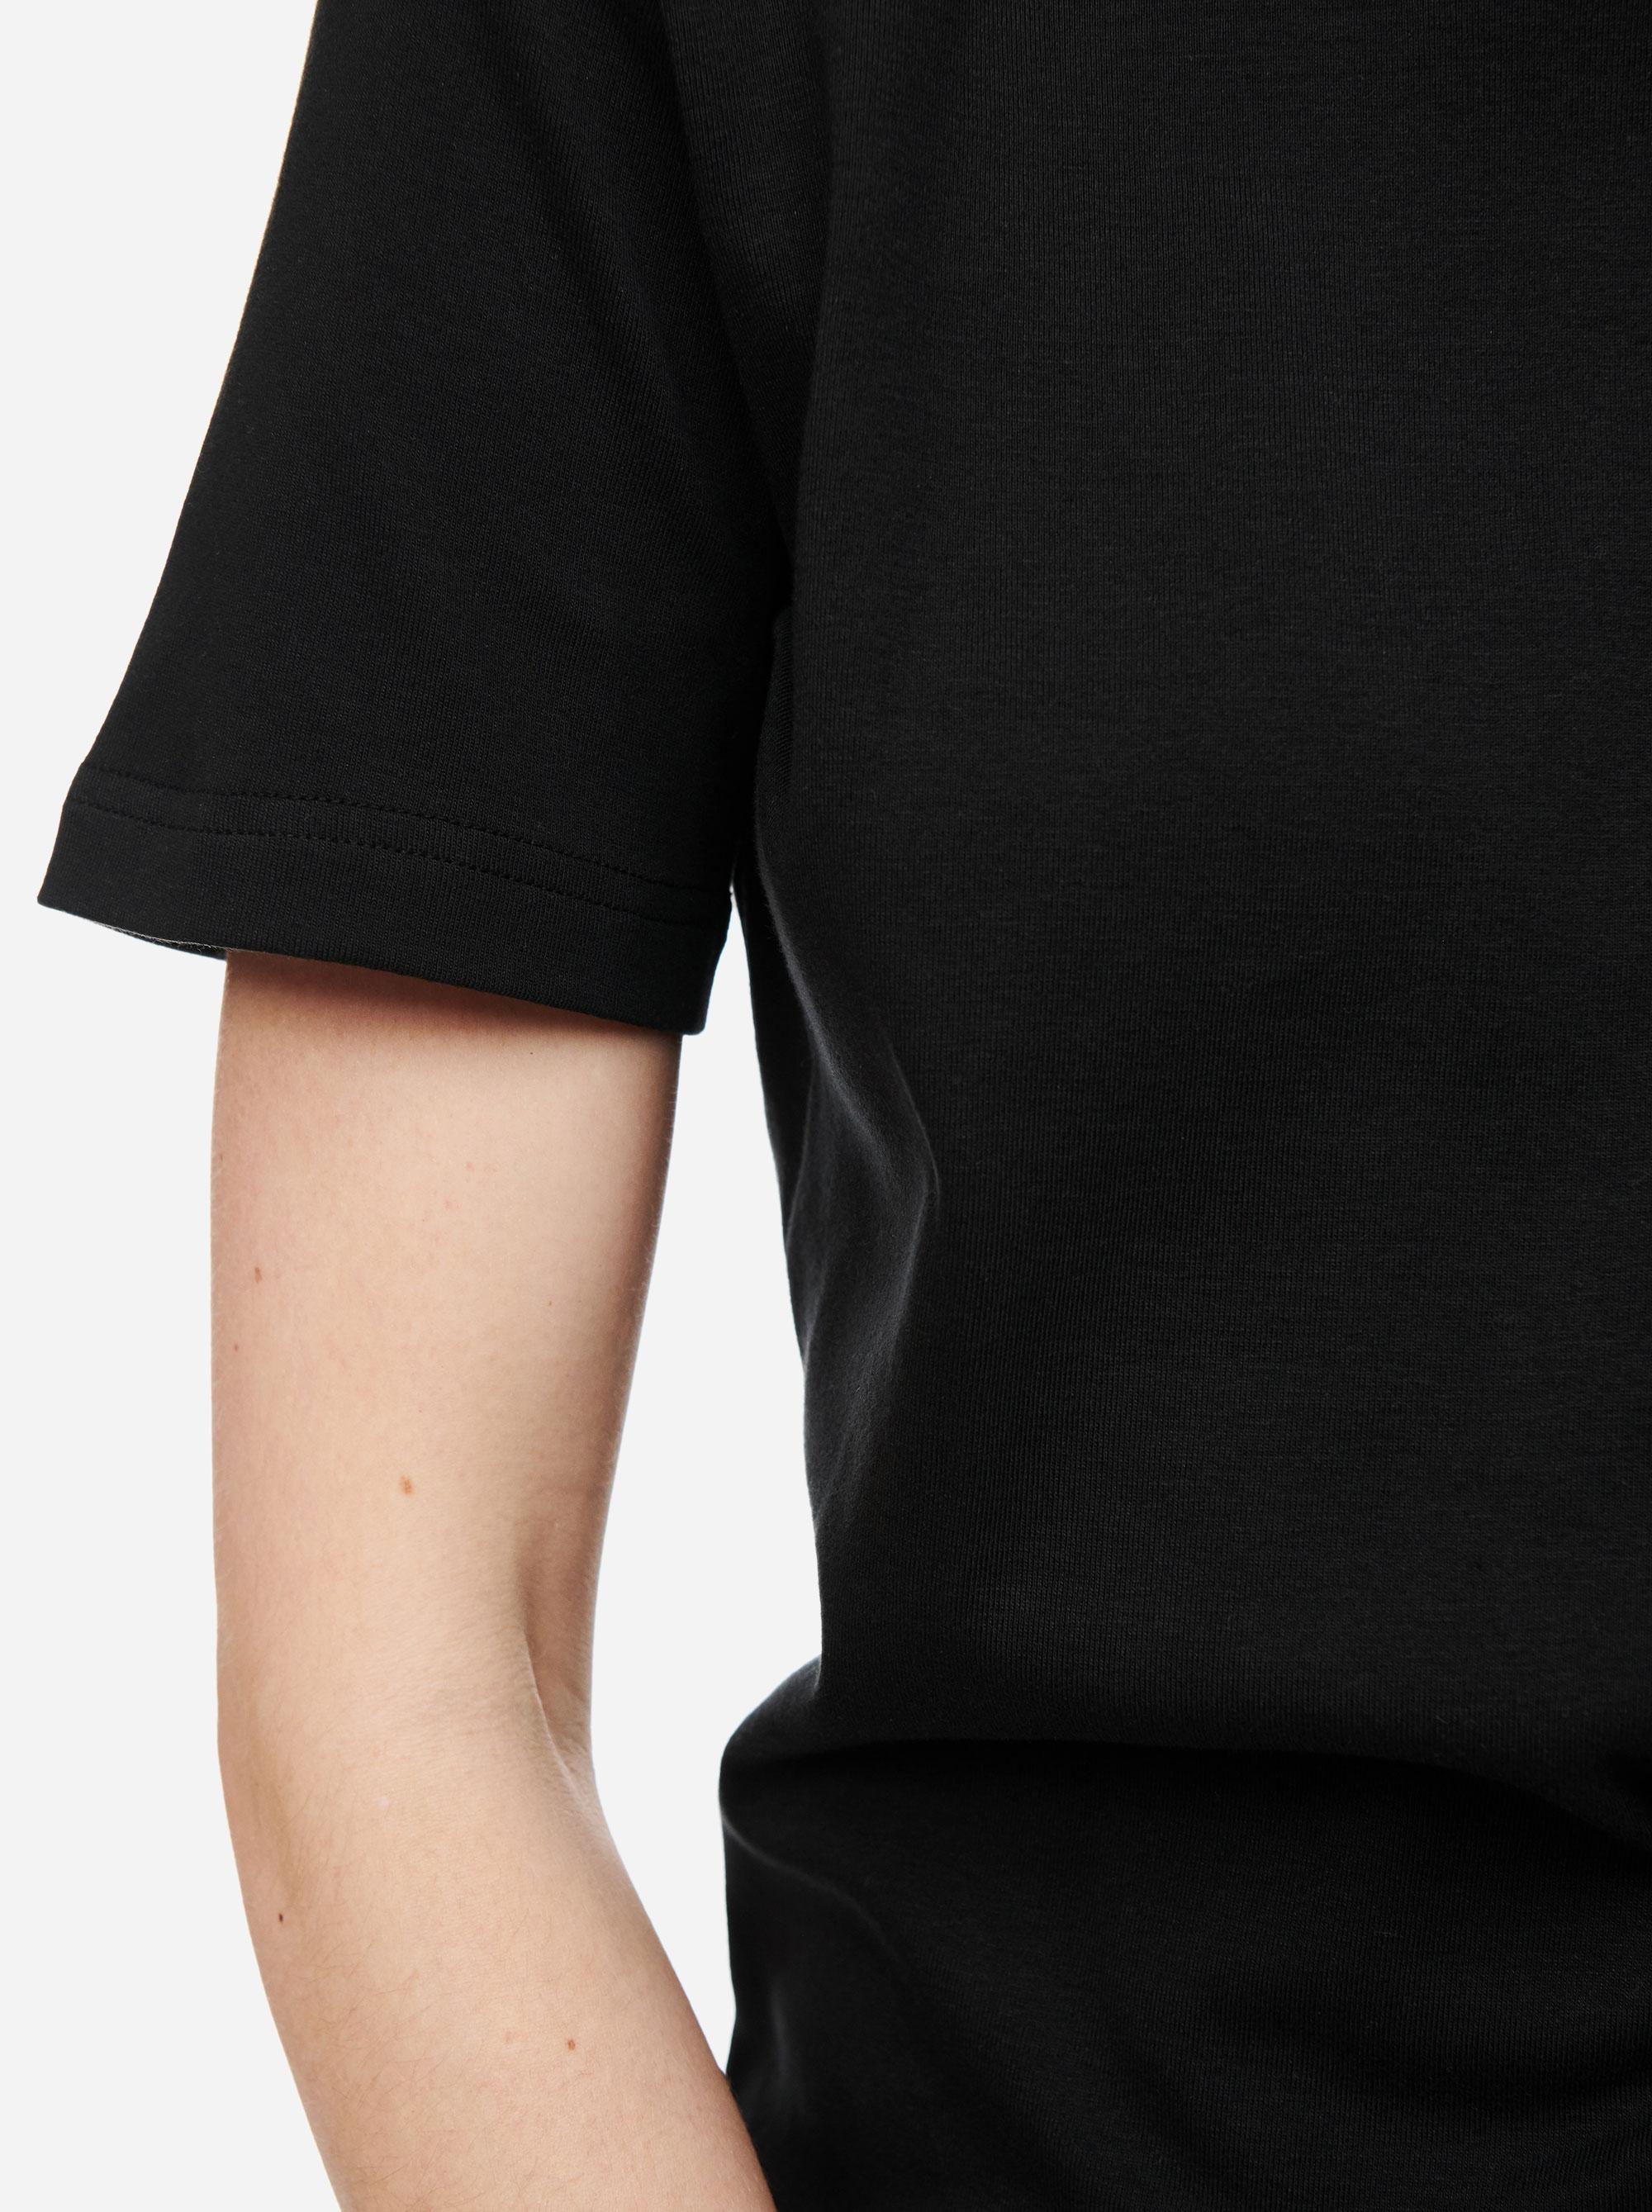 Teym - The T-Shirt - Women - Black4